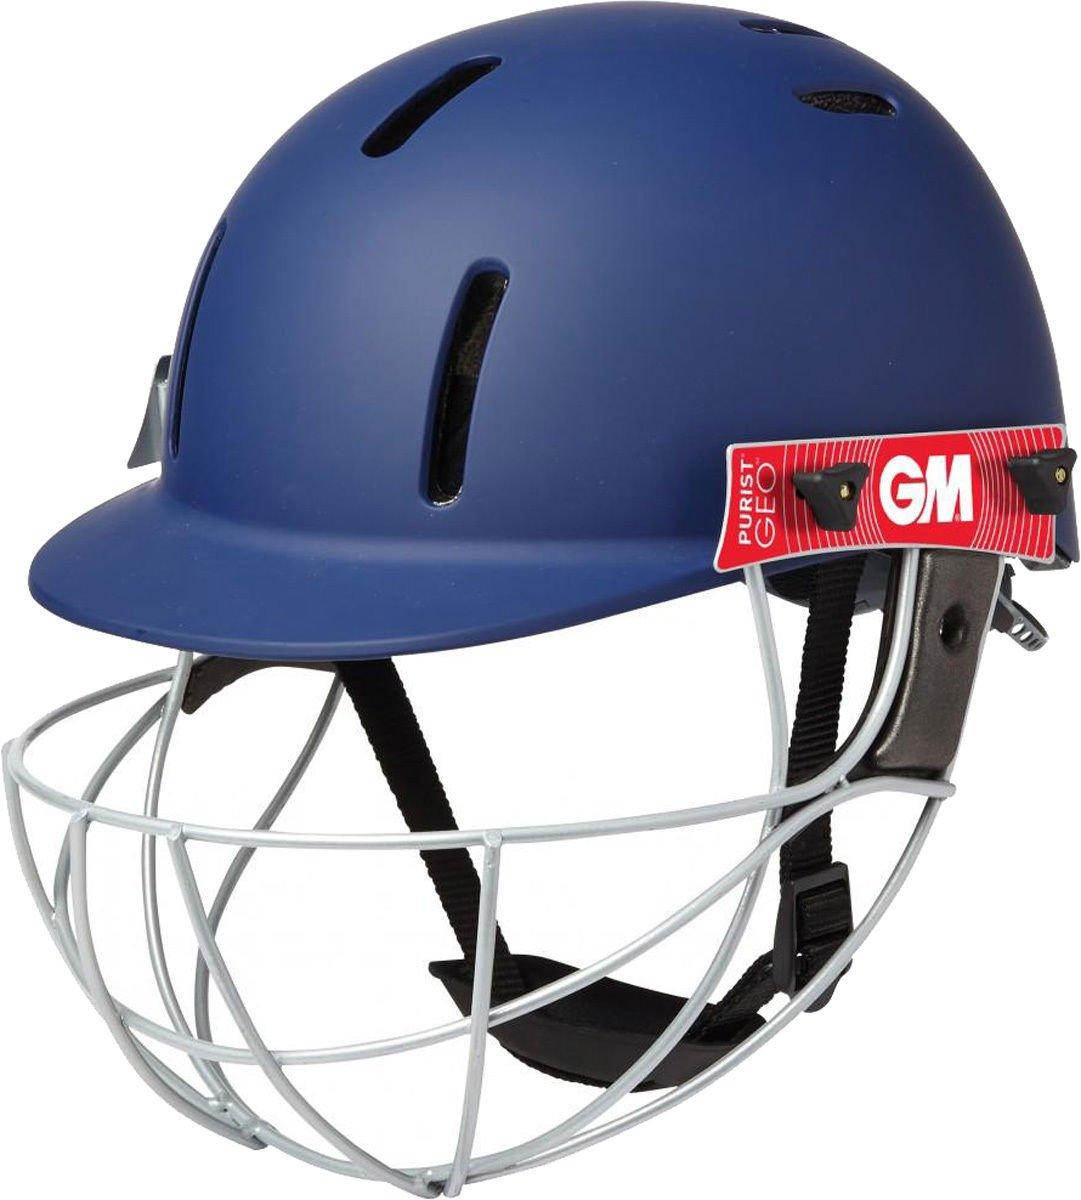 Gunn /& Moore Purist Geo Cricket Helmet Batsman Protection Size Jnr /& Snr